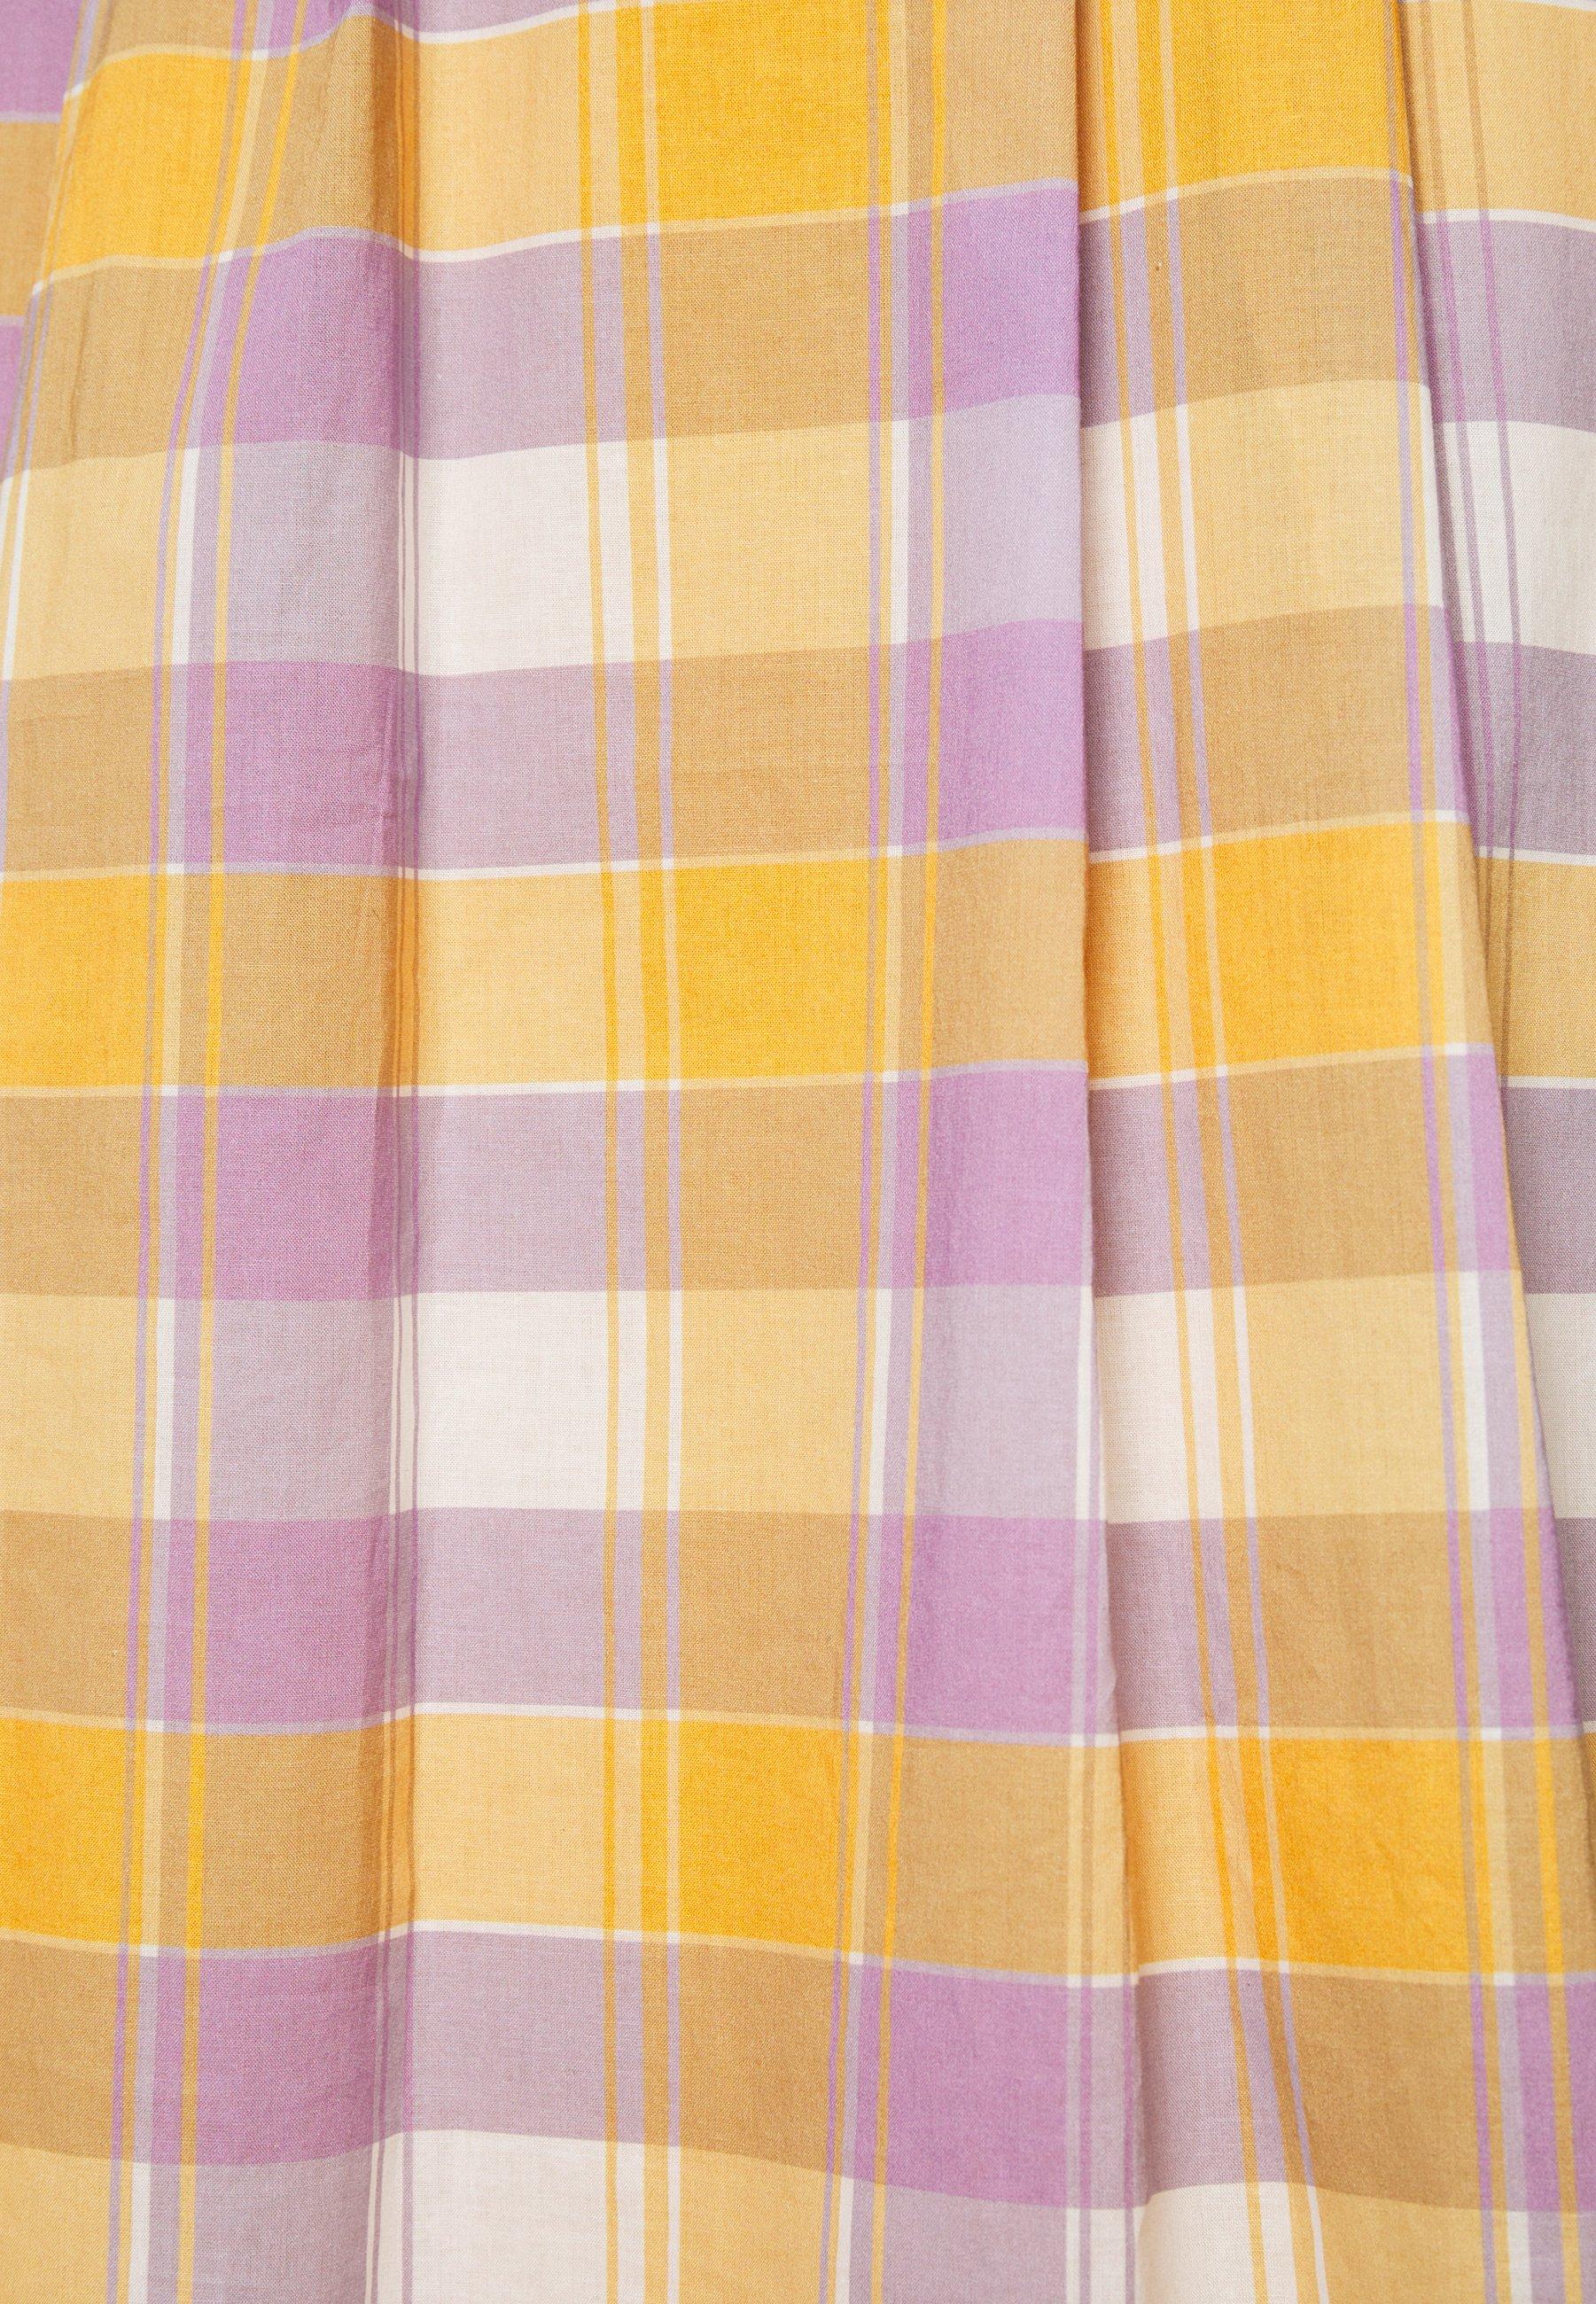 Safe Payment Women's Clothing Karen by Simonsen BIRKA DRESS Day dress narcissus f8ZnrBT9e